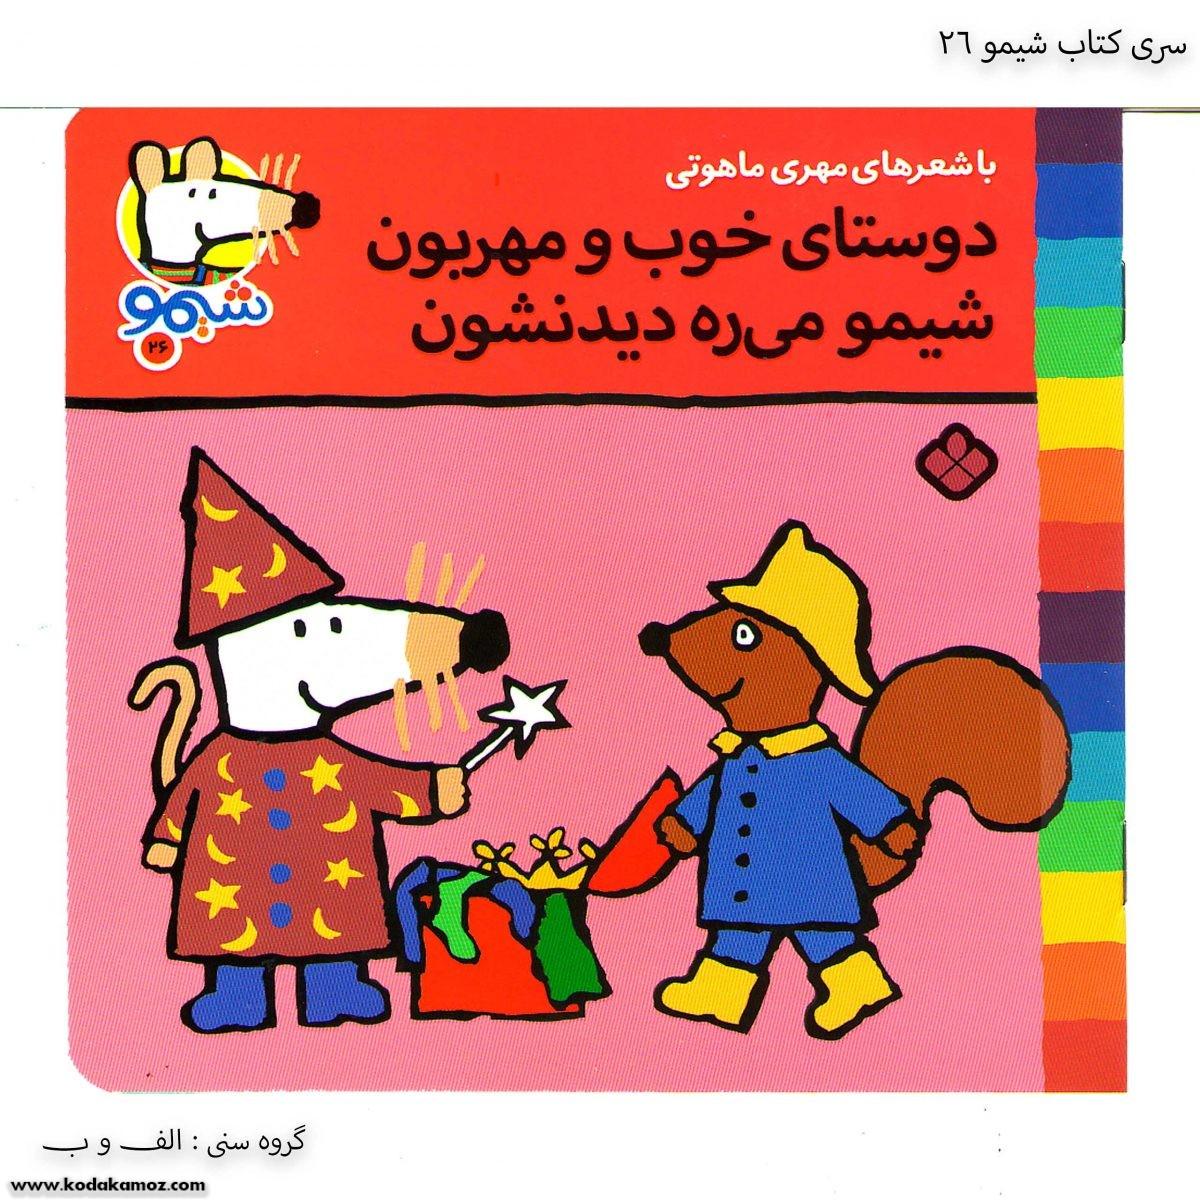 سری کتاب شیمو دوستای خوب و مهربون شیمو میره دیدنشون کد 26